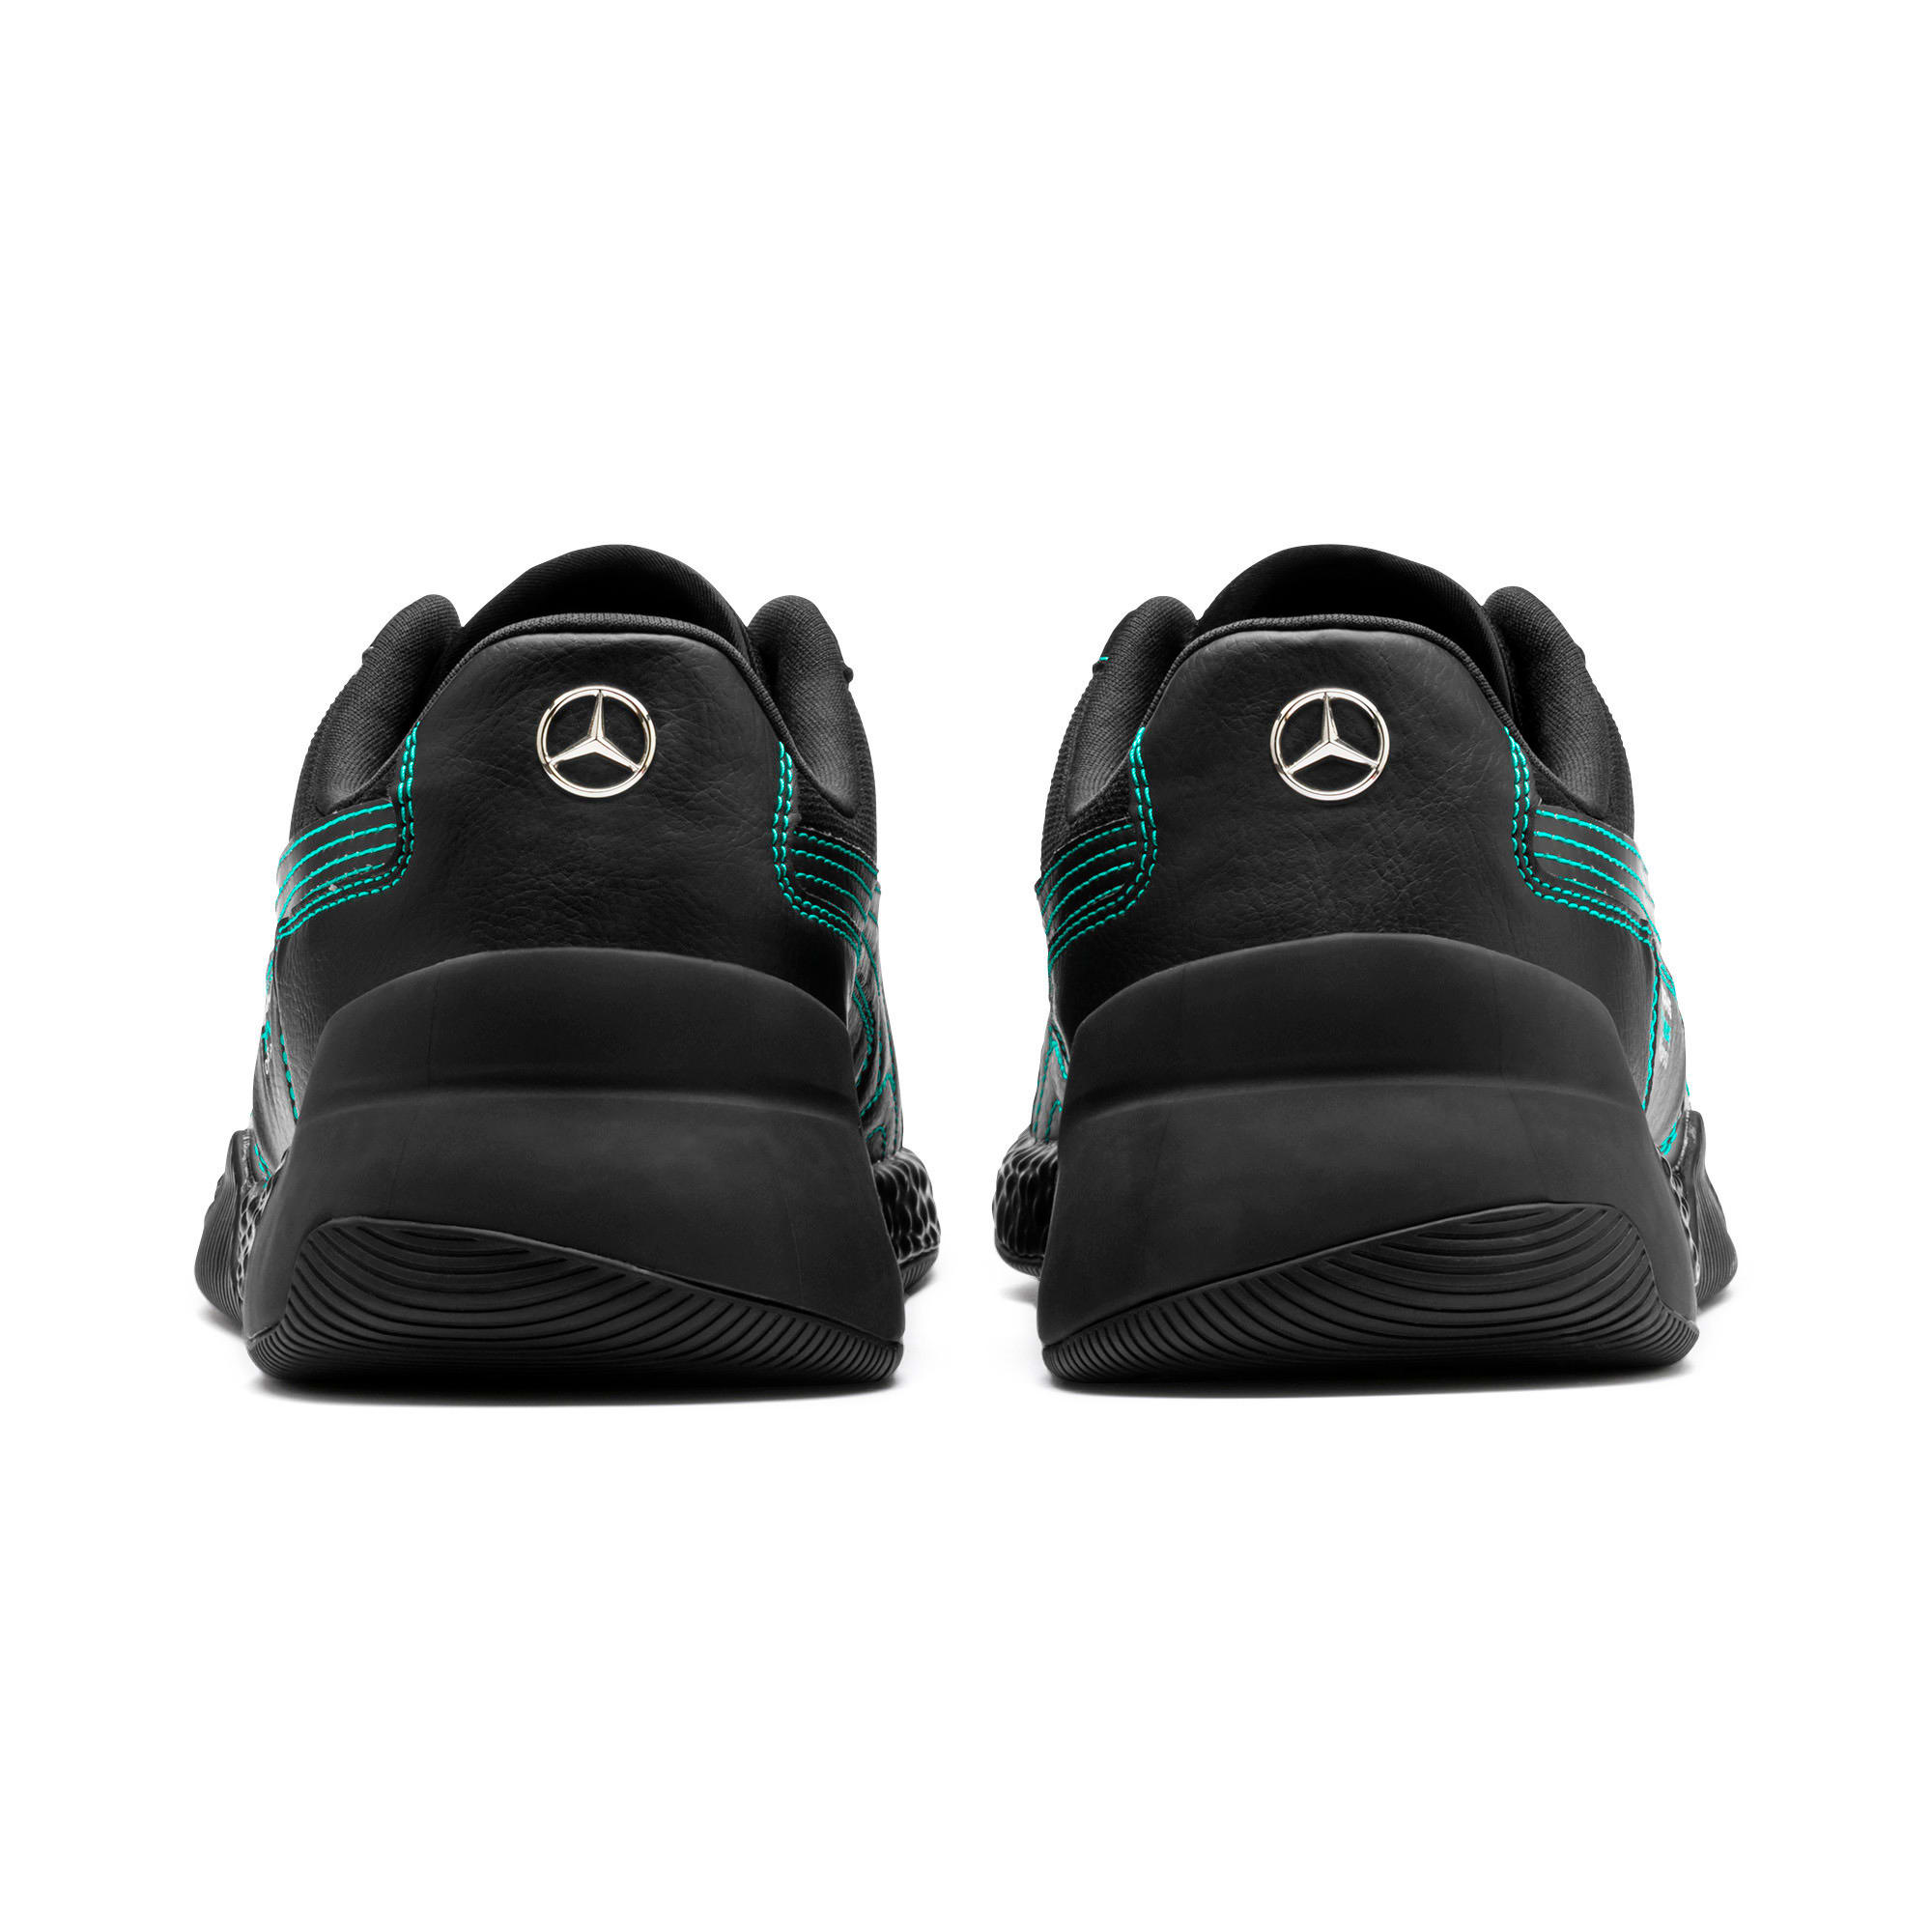 Thumbnail 4 of Mercedes AMG Petronas Speed HYBRID Running Shoes, Puma Black-Spectra Green, medium